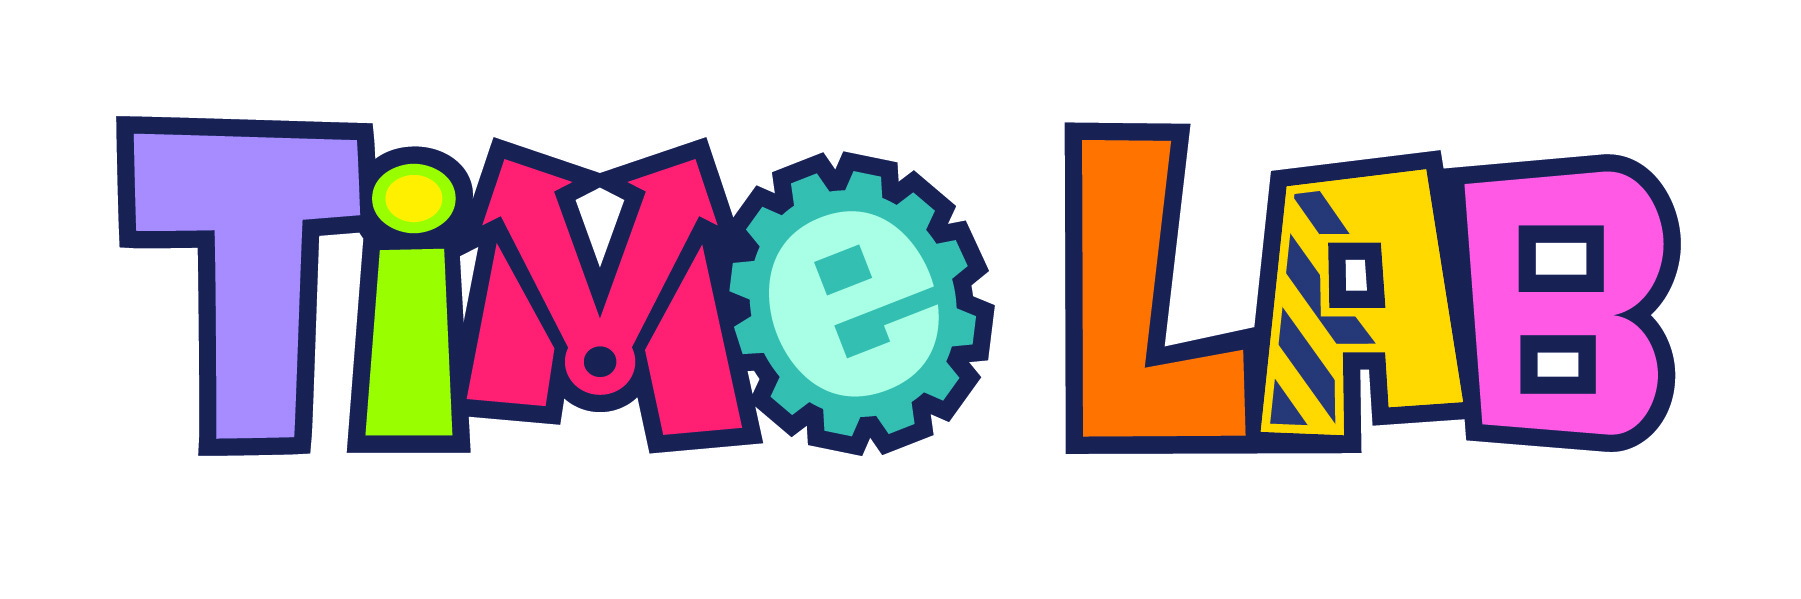 Time Lab - 2018 VBS logo